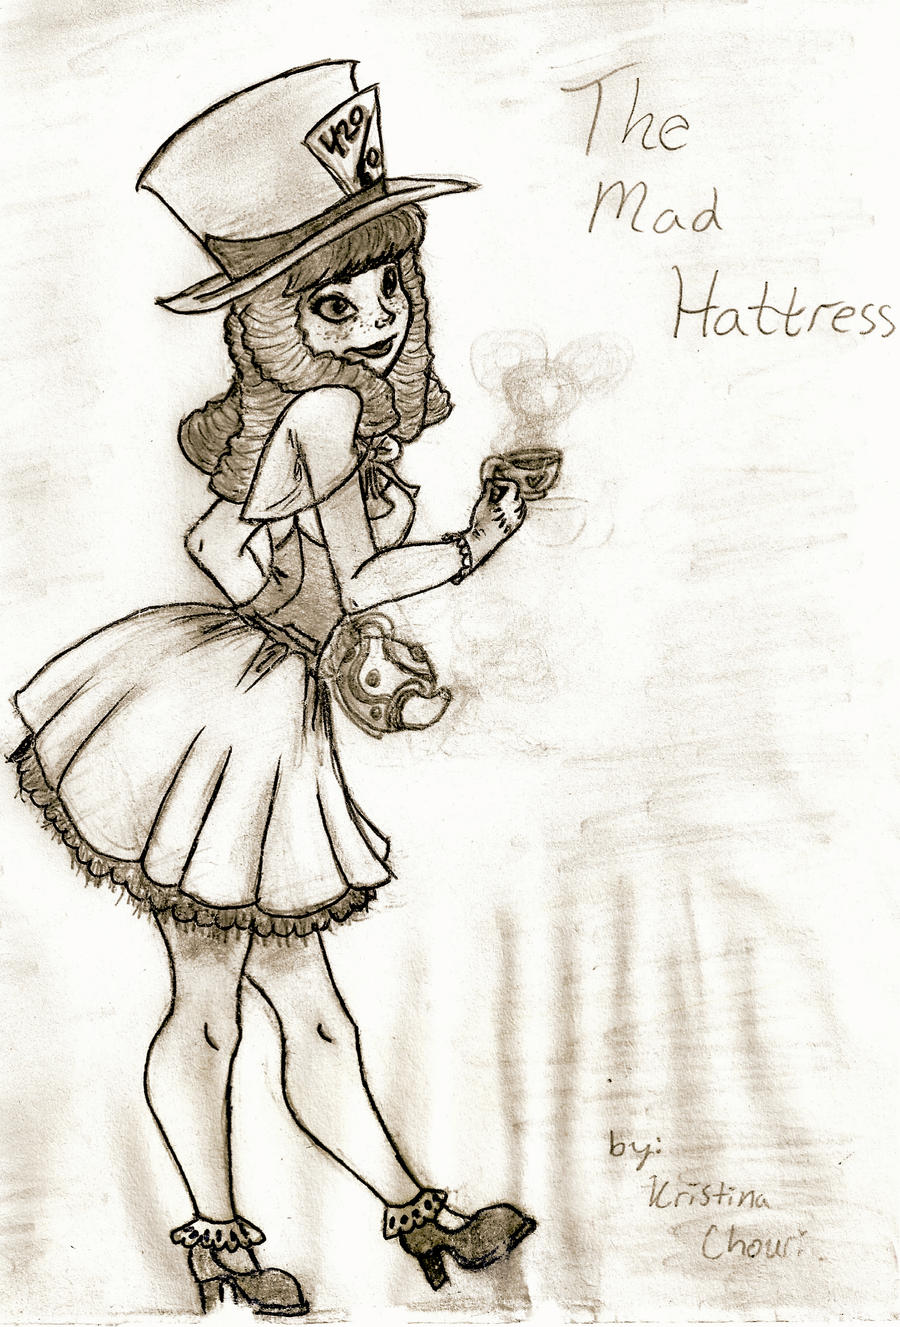 Mad Hattress by Chourios